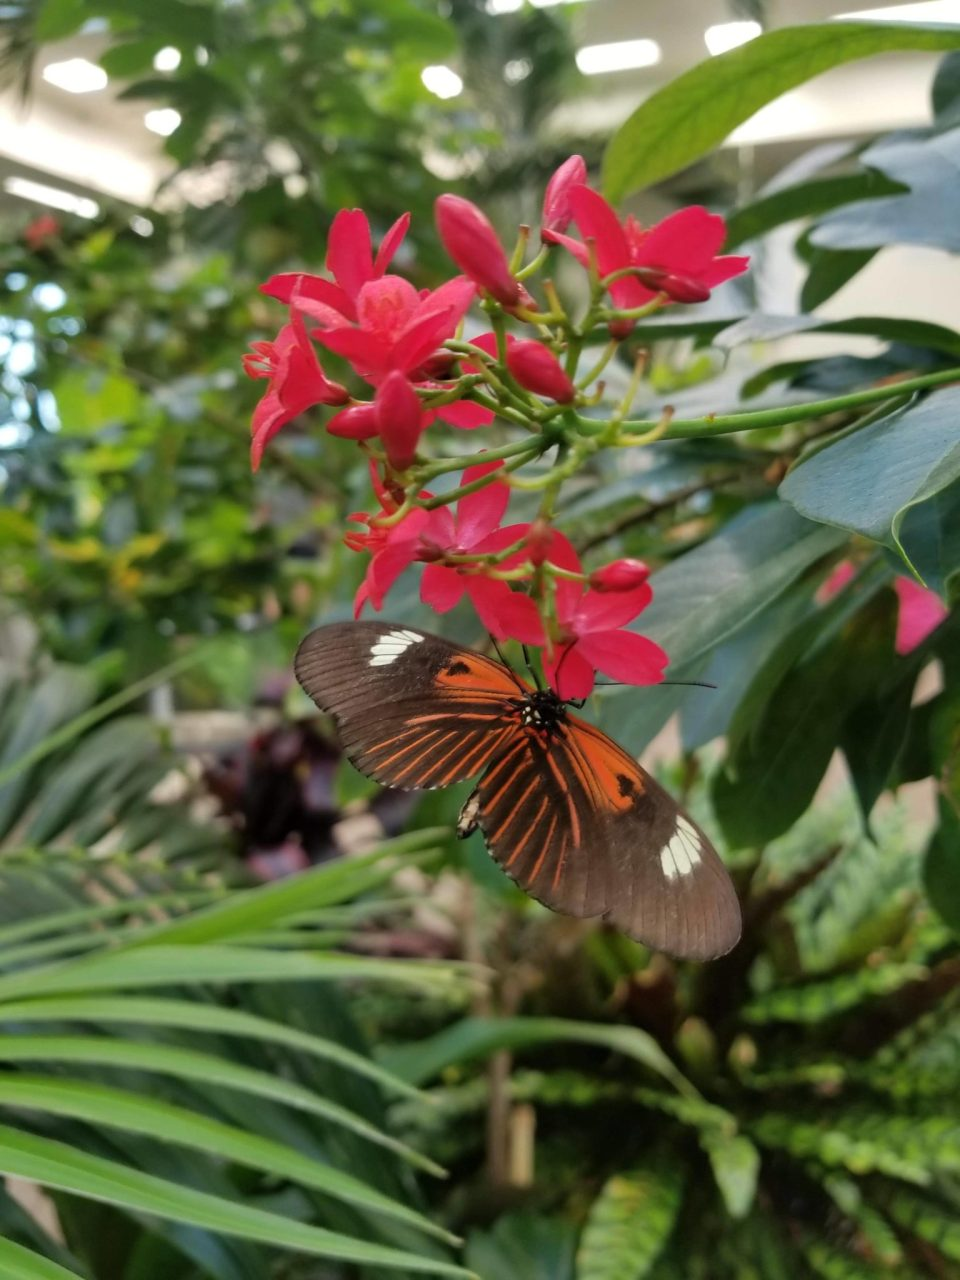 Hershey Gardens Butterfly Atrium